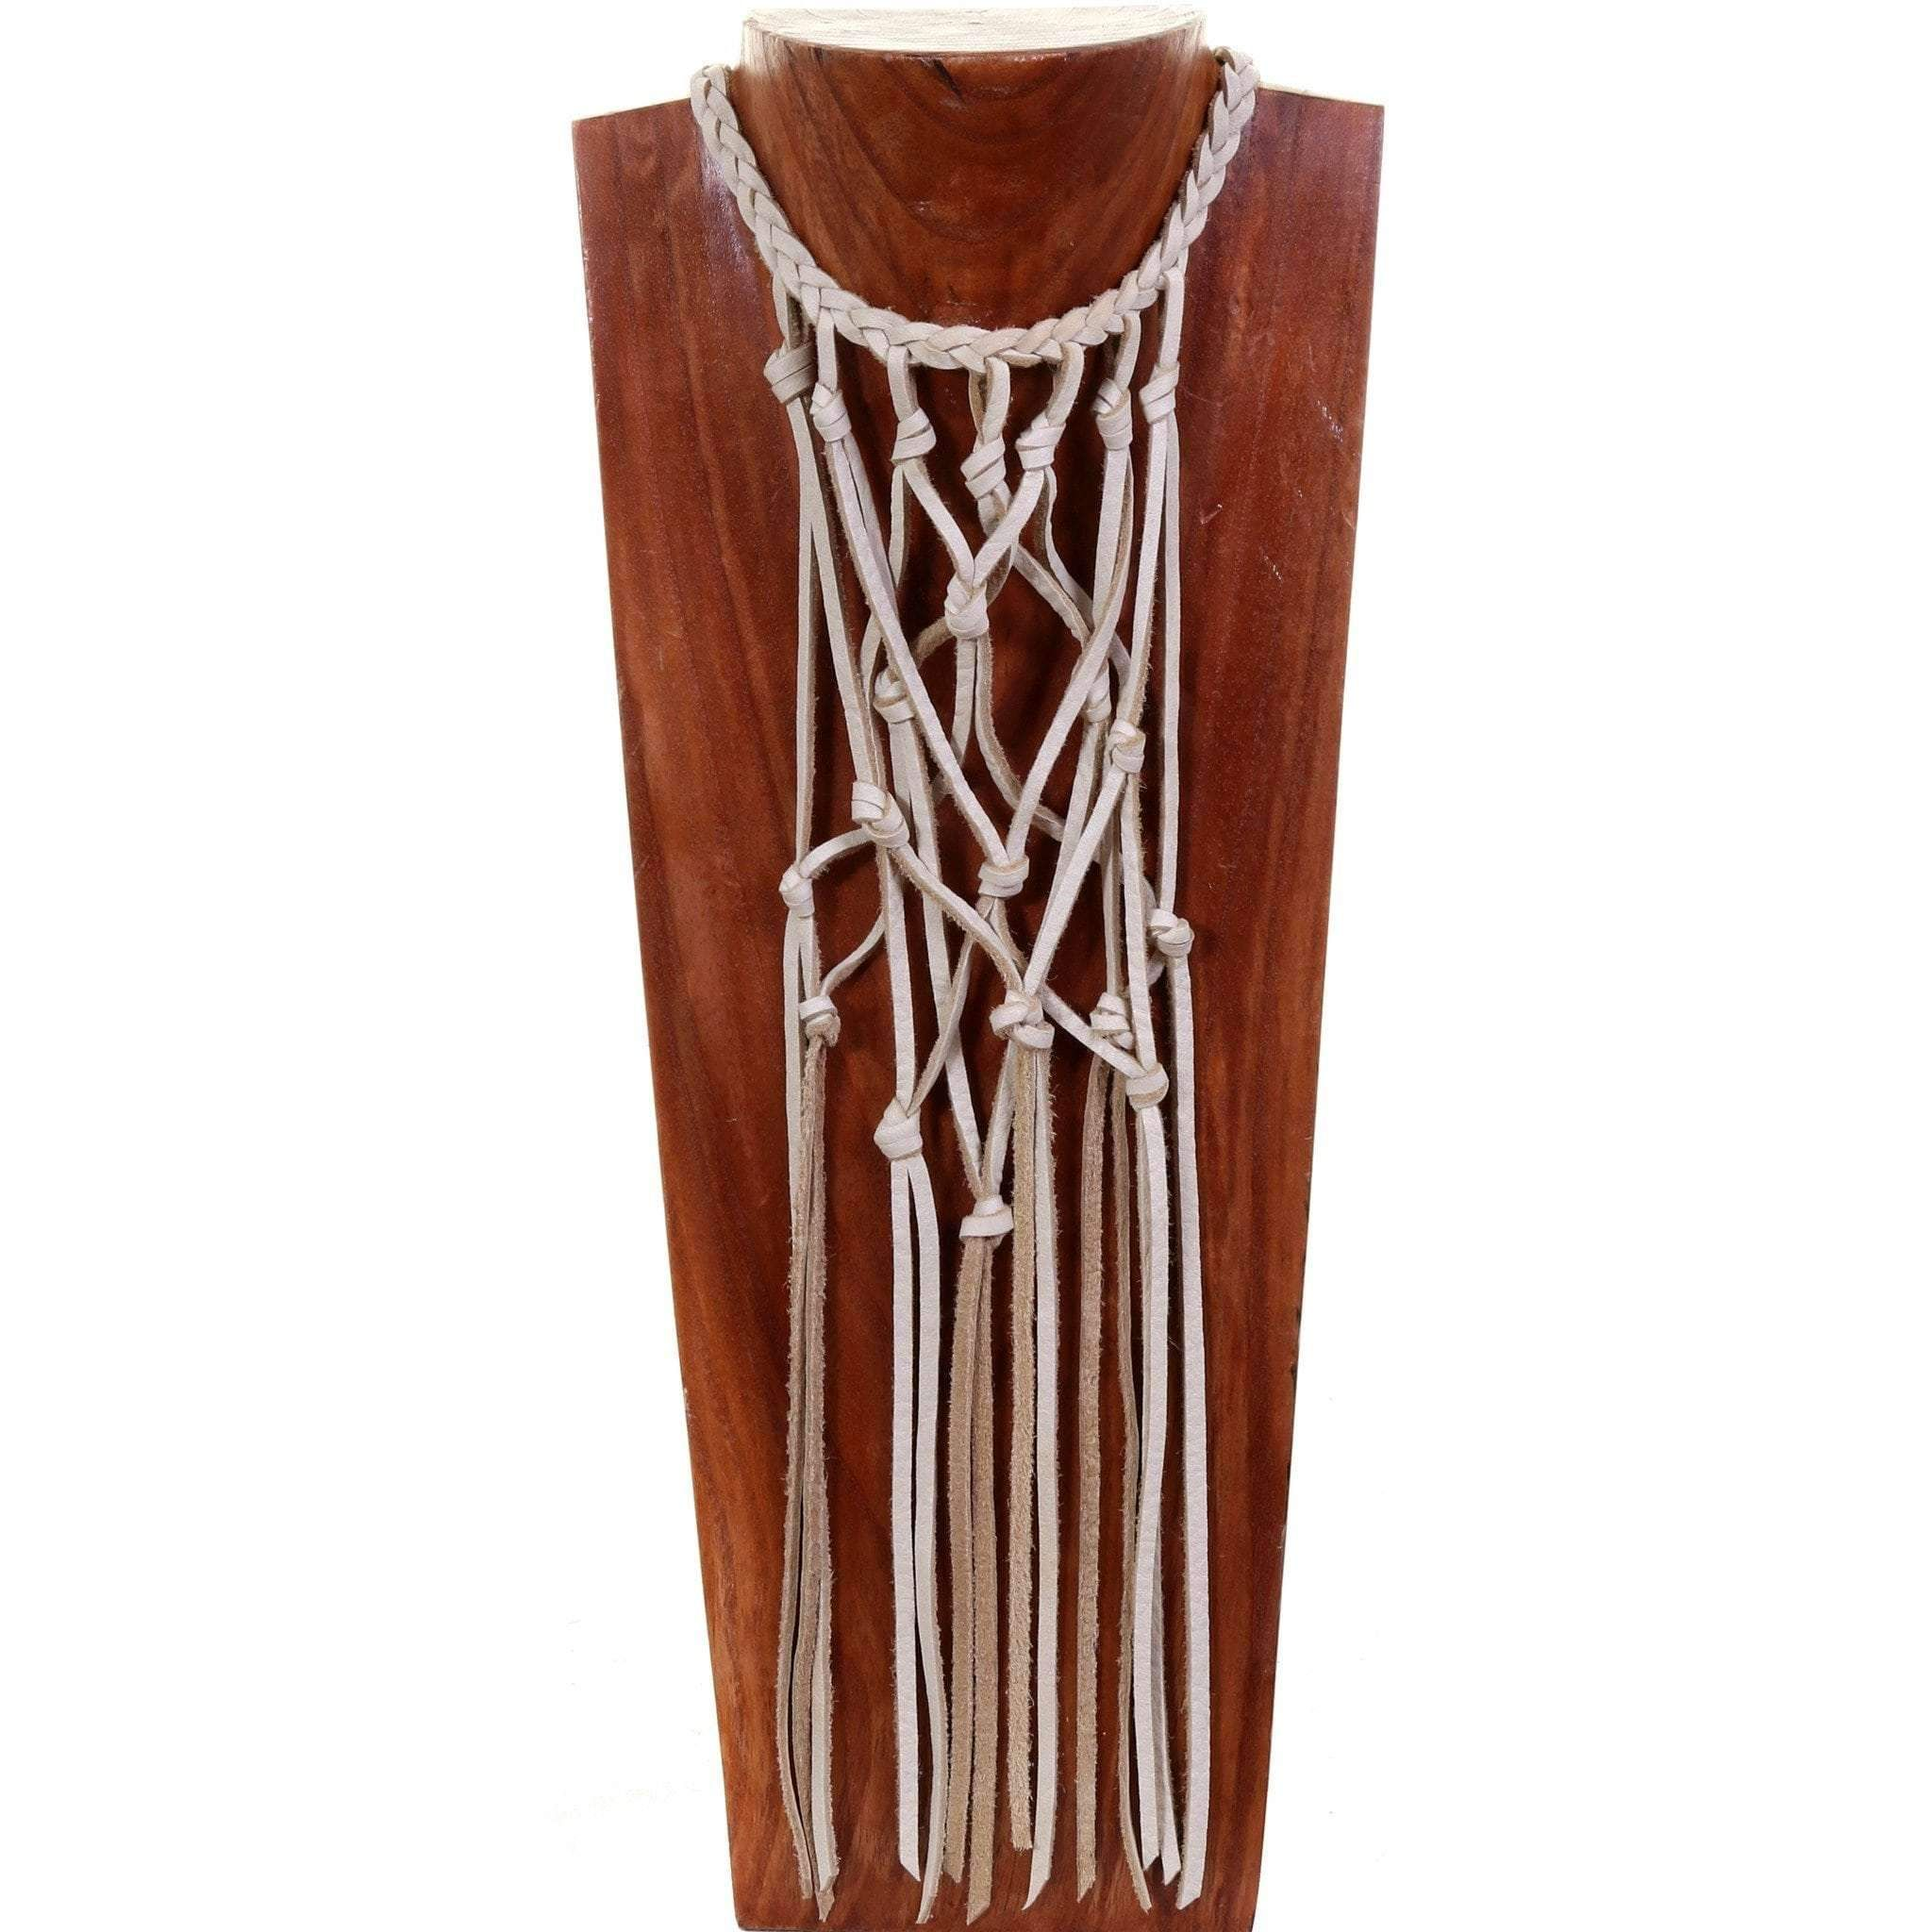 Vestige necklace in cream elk skin, macrame with bone beads.